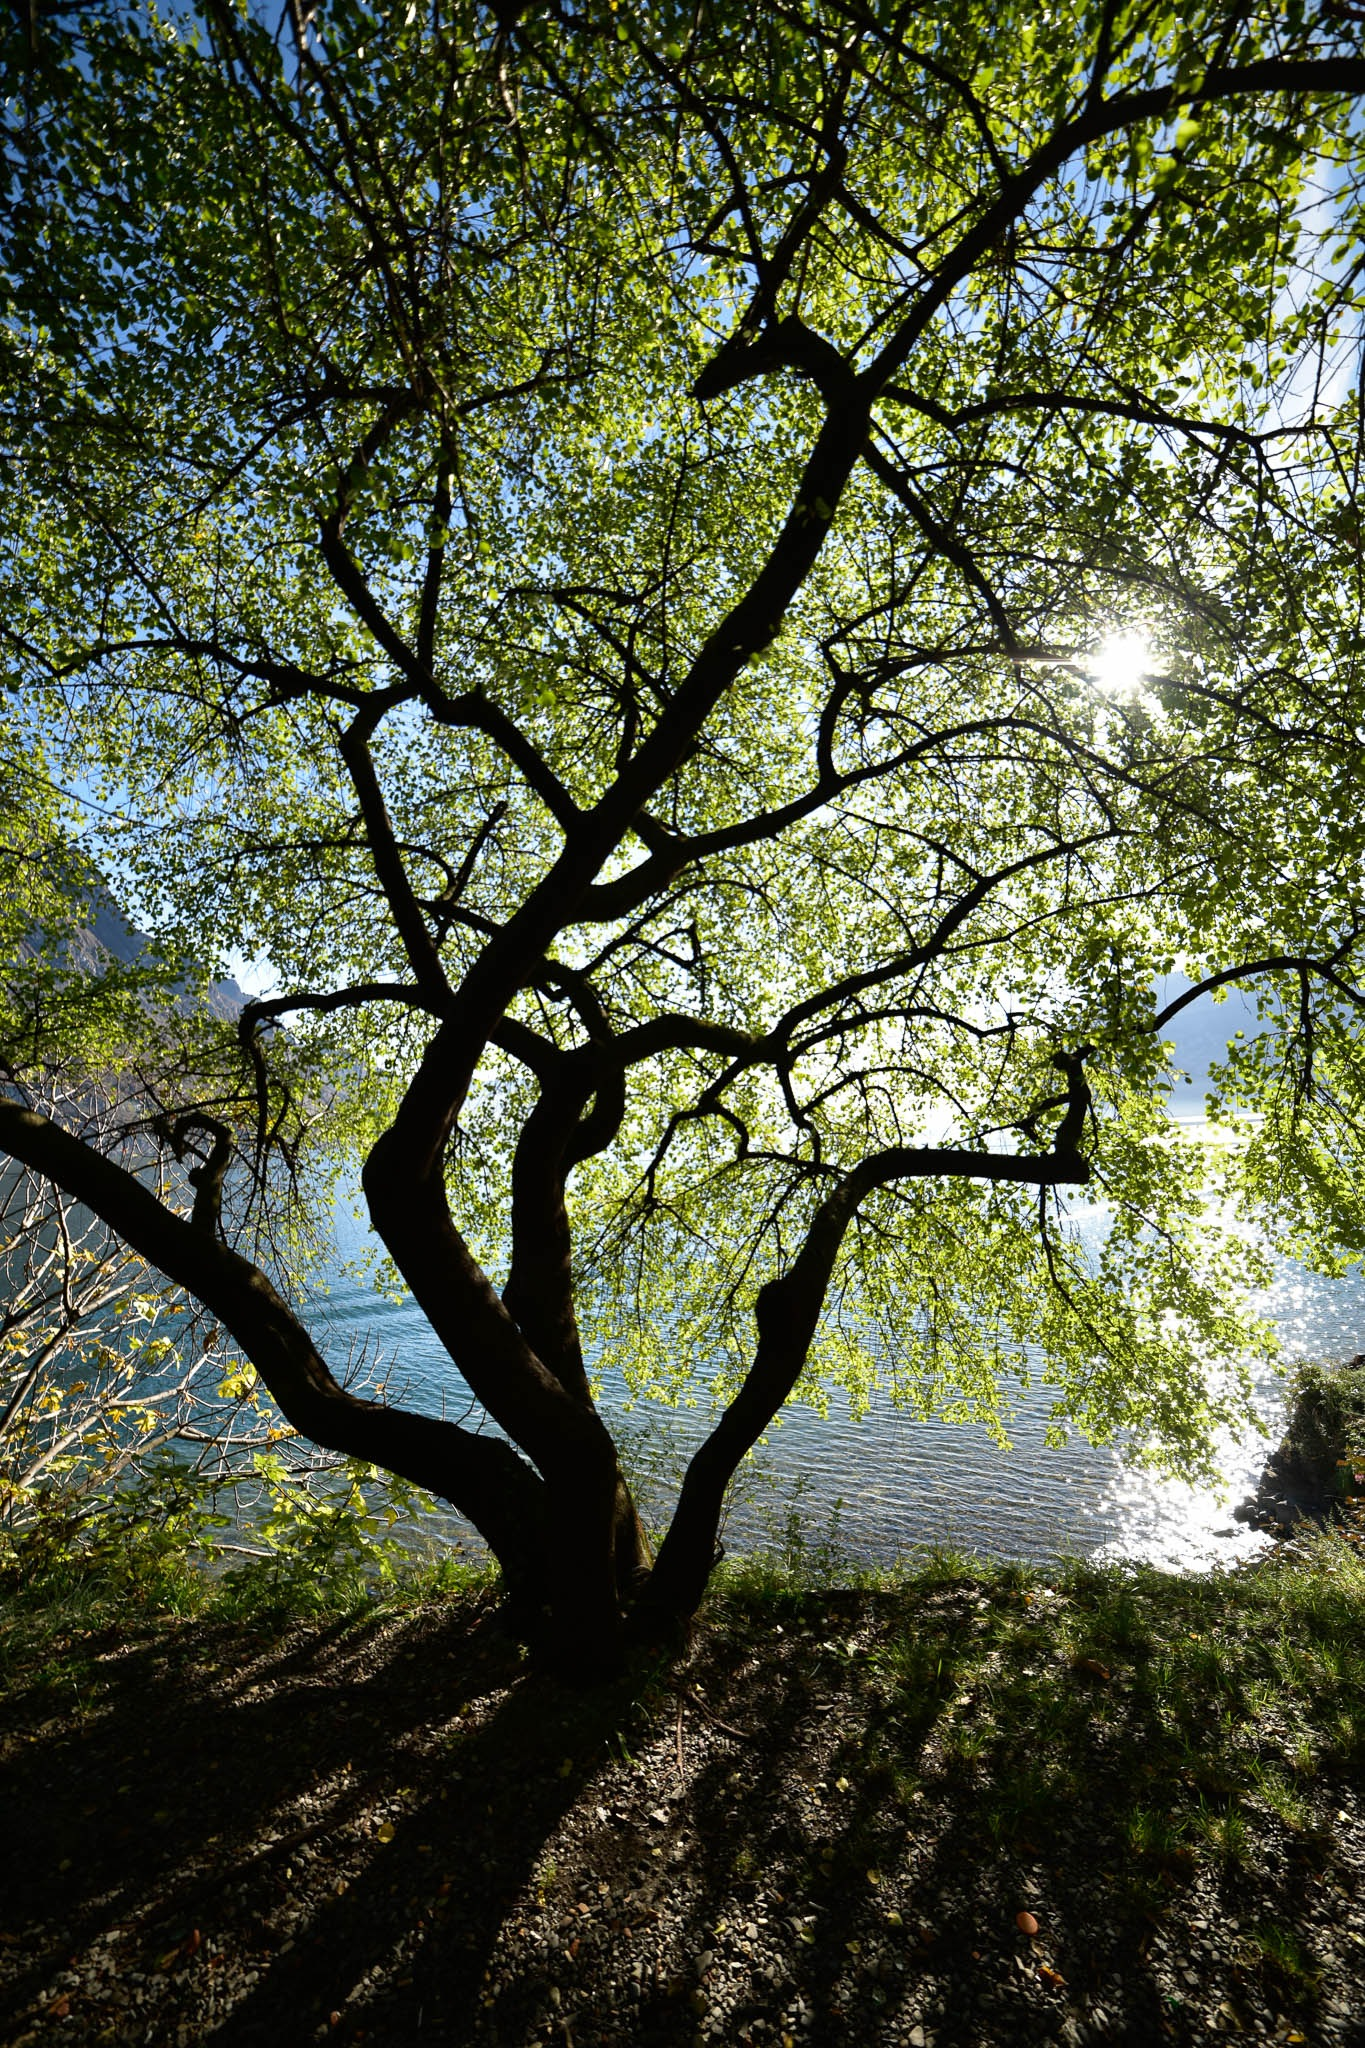 Twisted tree by roberto.fustinoni.60